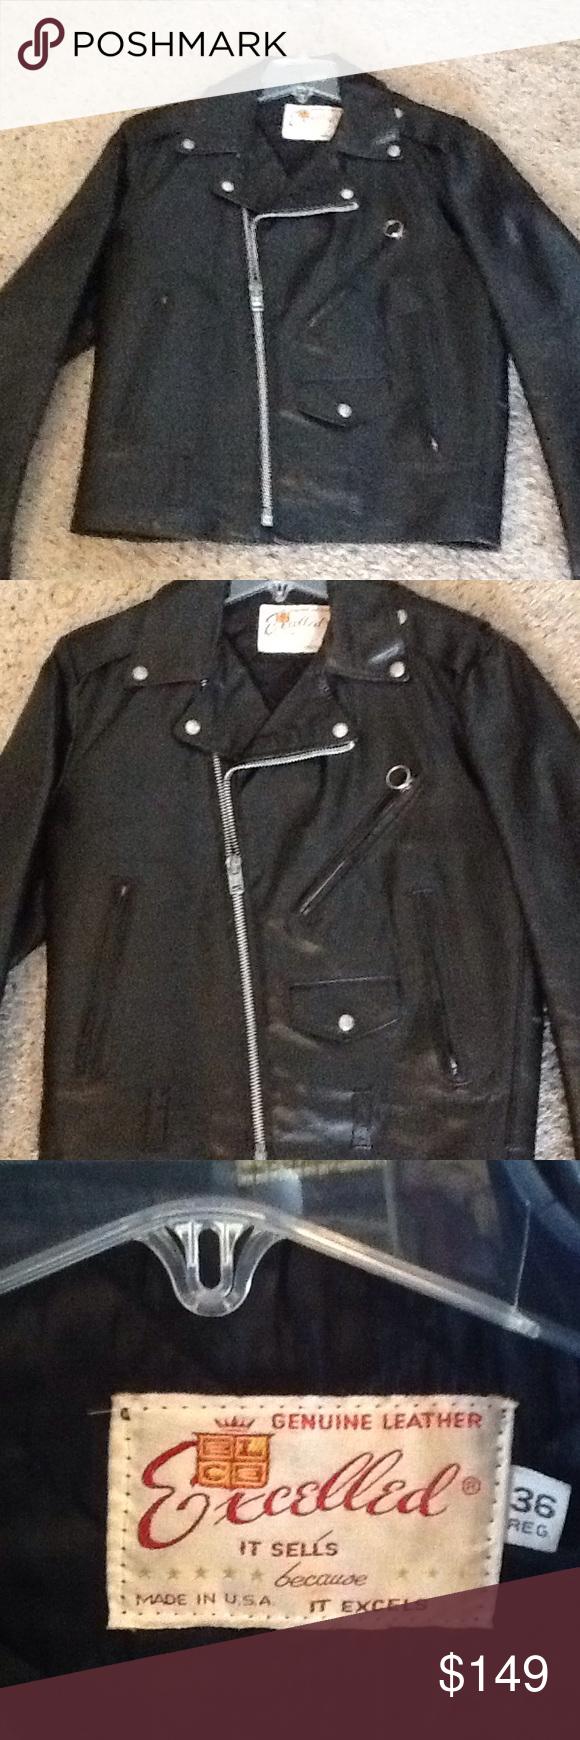 Excelled Vintage Motorcycle Moto Biker Jacket Mint Nwot Excelled Sz 36 Black Leather Biker Moto Jacket New W Vintage Jacket Clothes Design Outfit Accessories [ 1740 x 580 Pixel ]